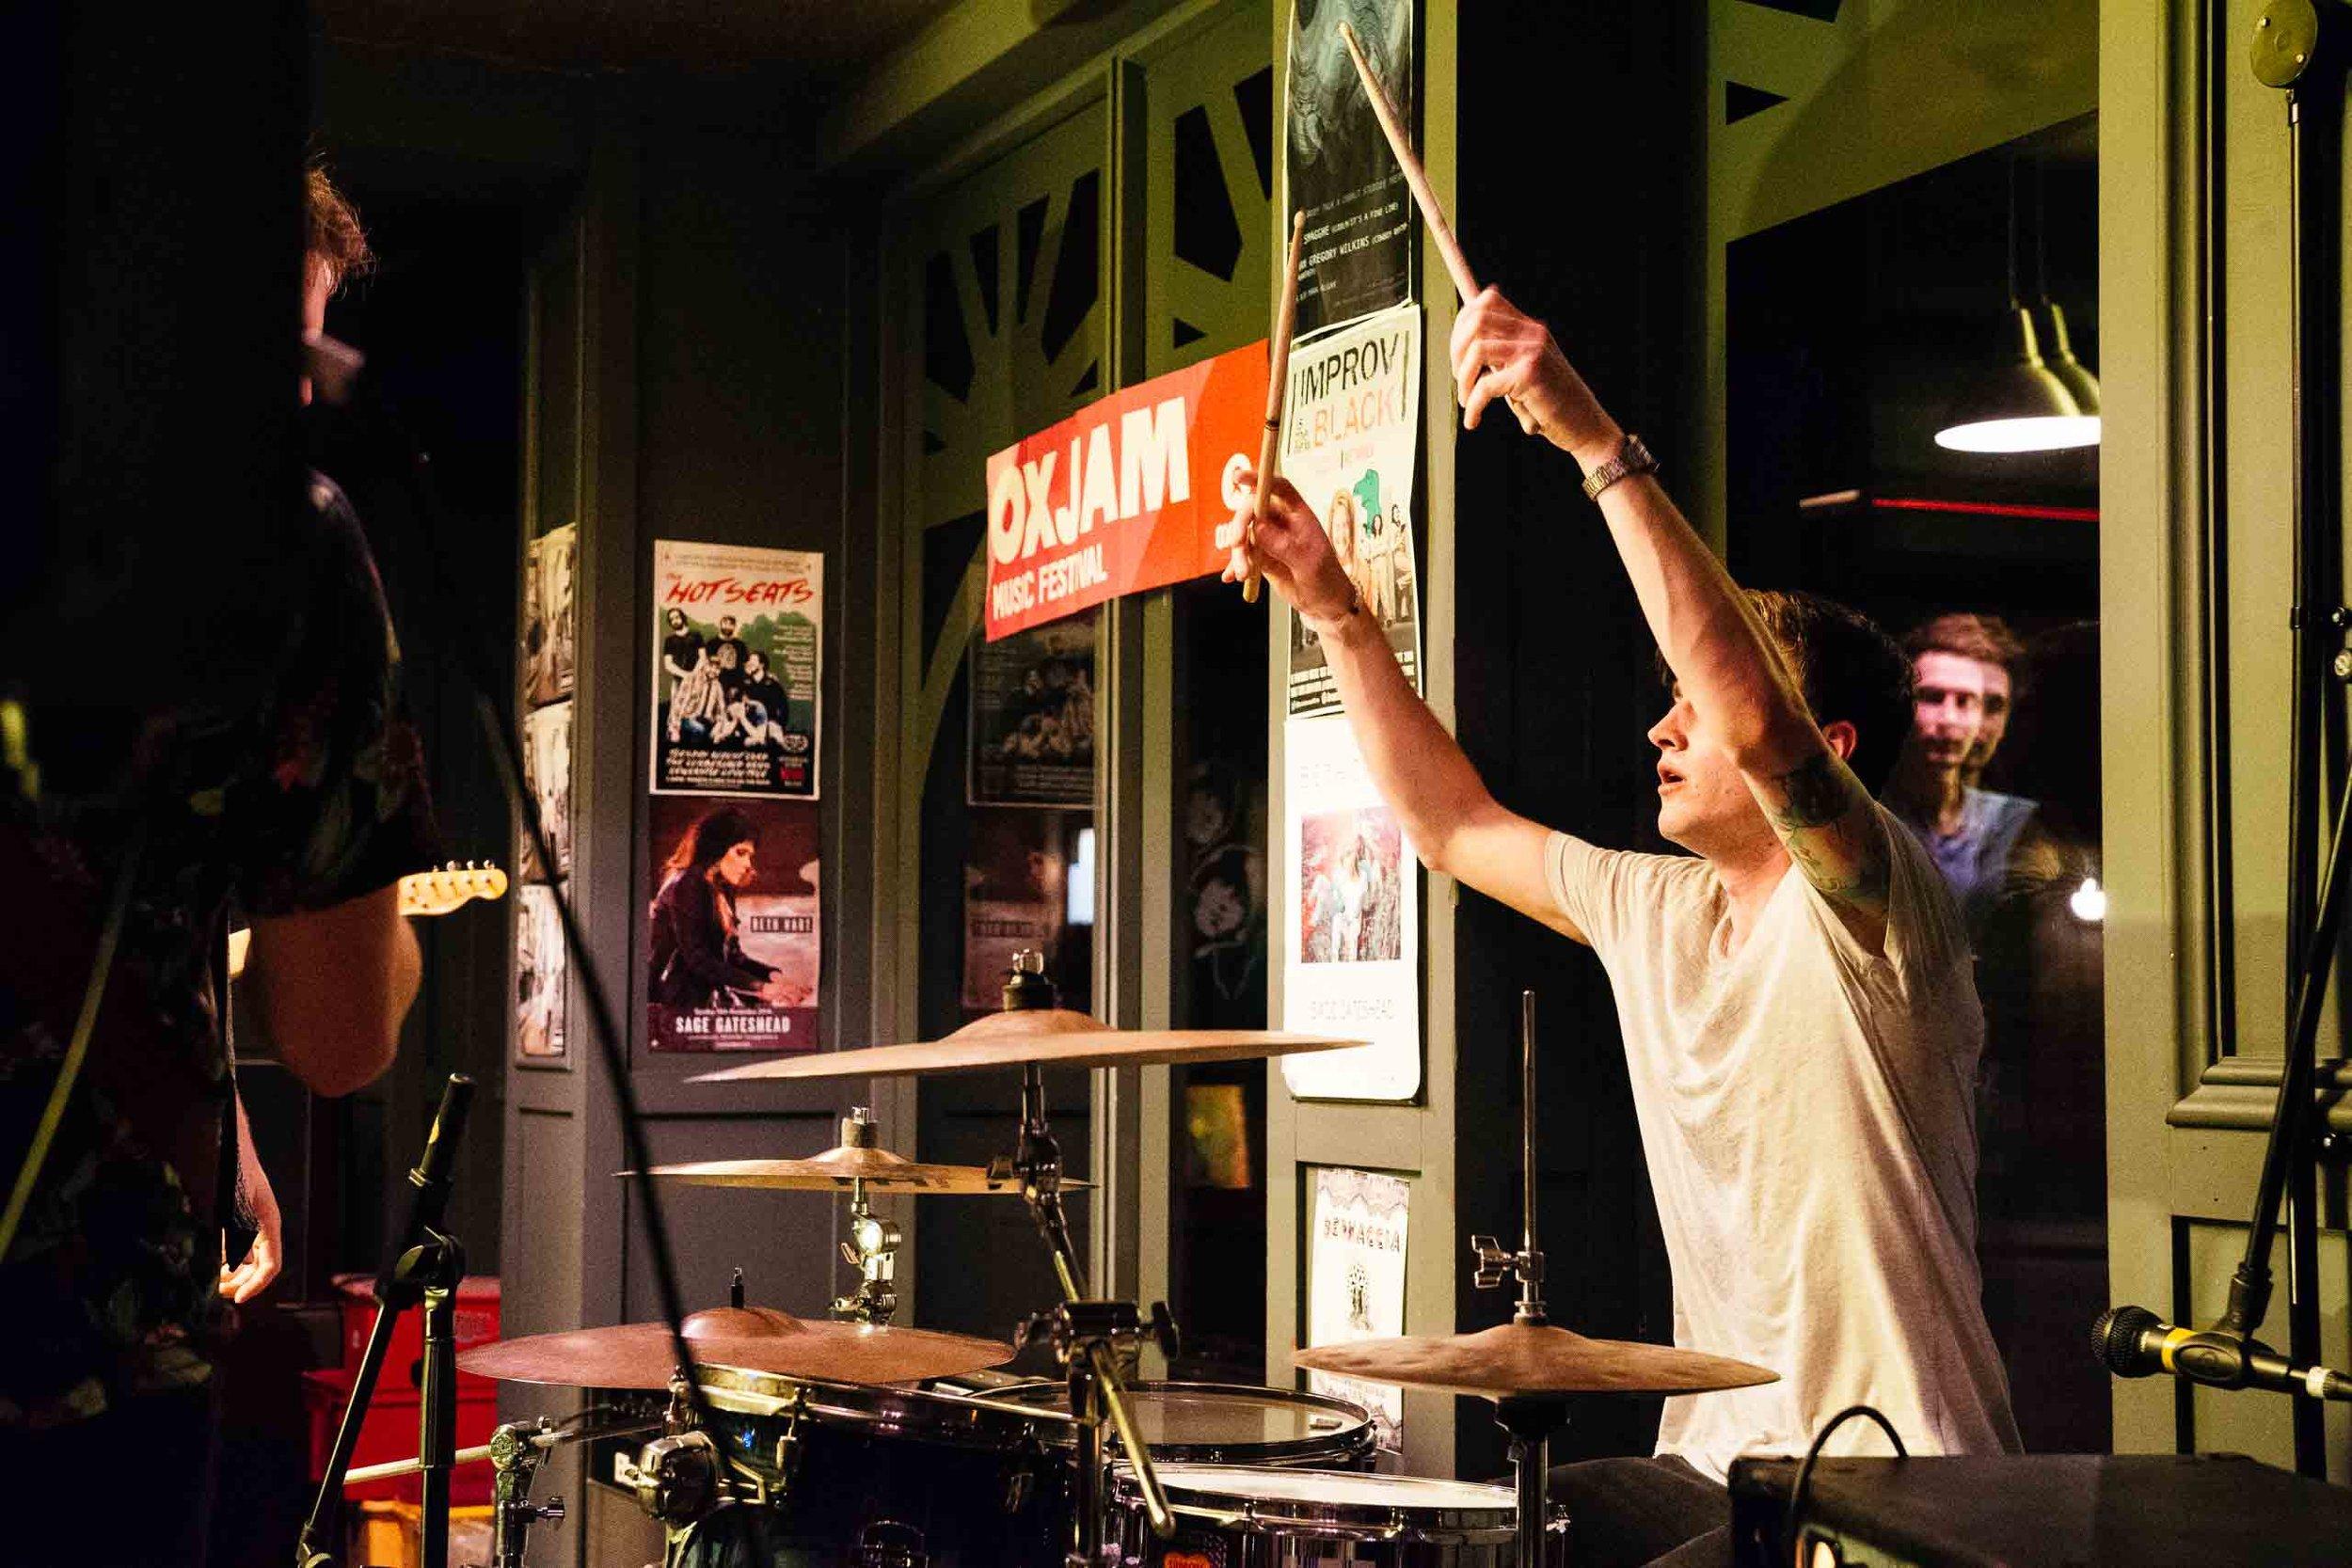 2016-08-22 Oxjam Newcastle 2016 fundraiser at Long Play Cafe (6000 x 4000, 35 mm, 1-160 sec at f - 4.0).jpg